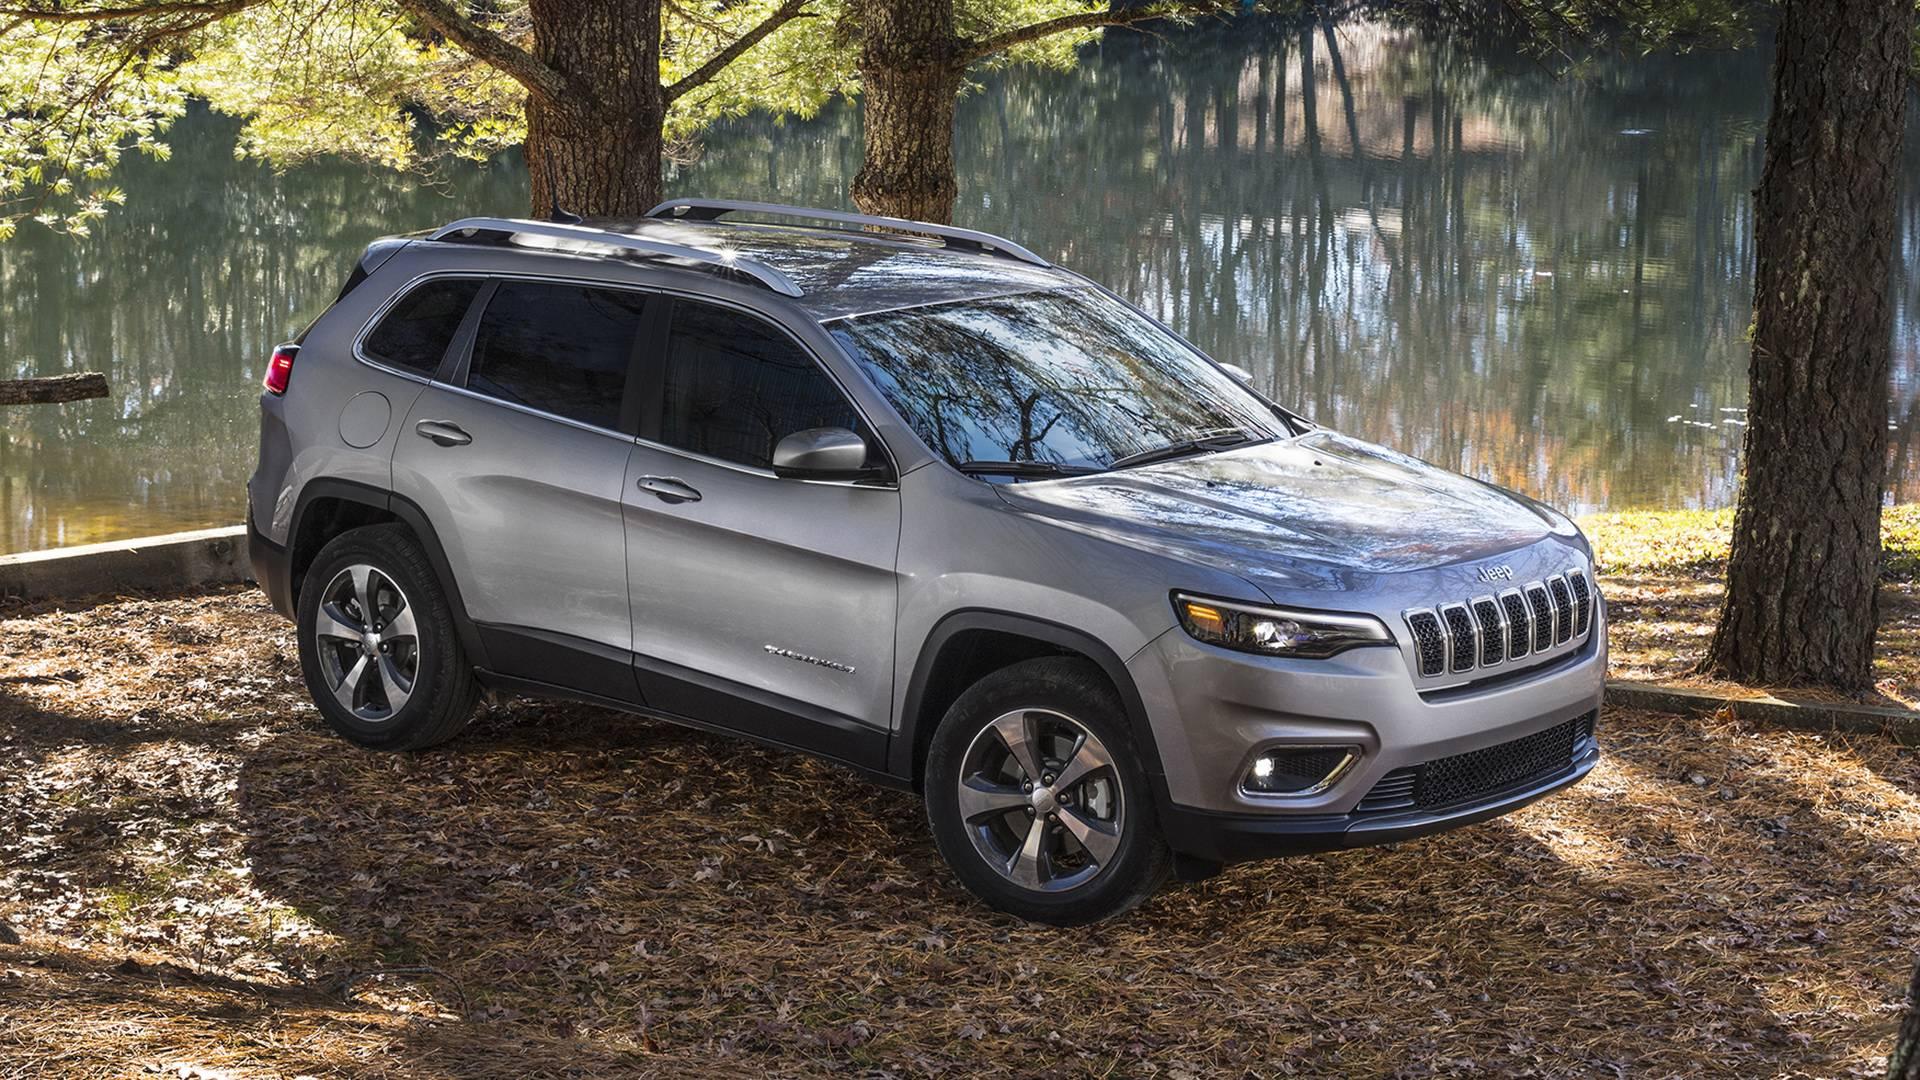 Jeep Cherokee 2019 — фотогалерея